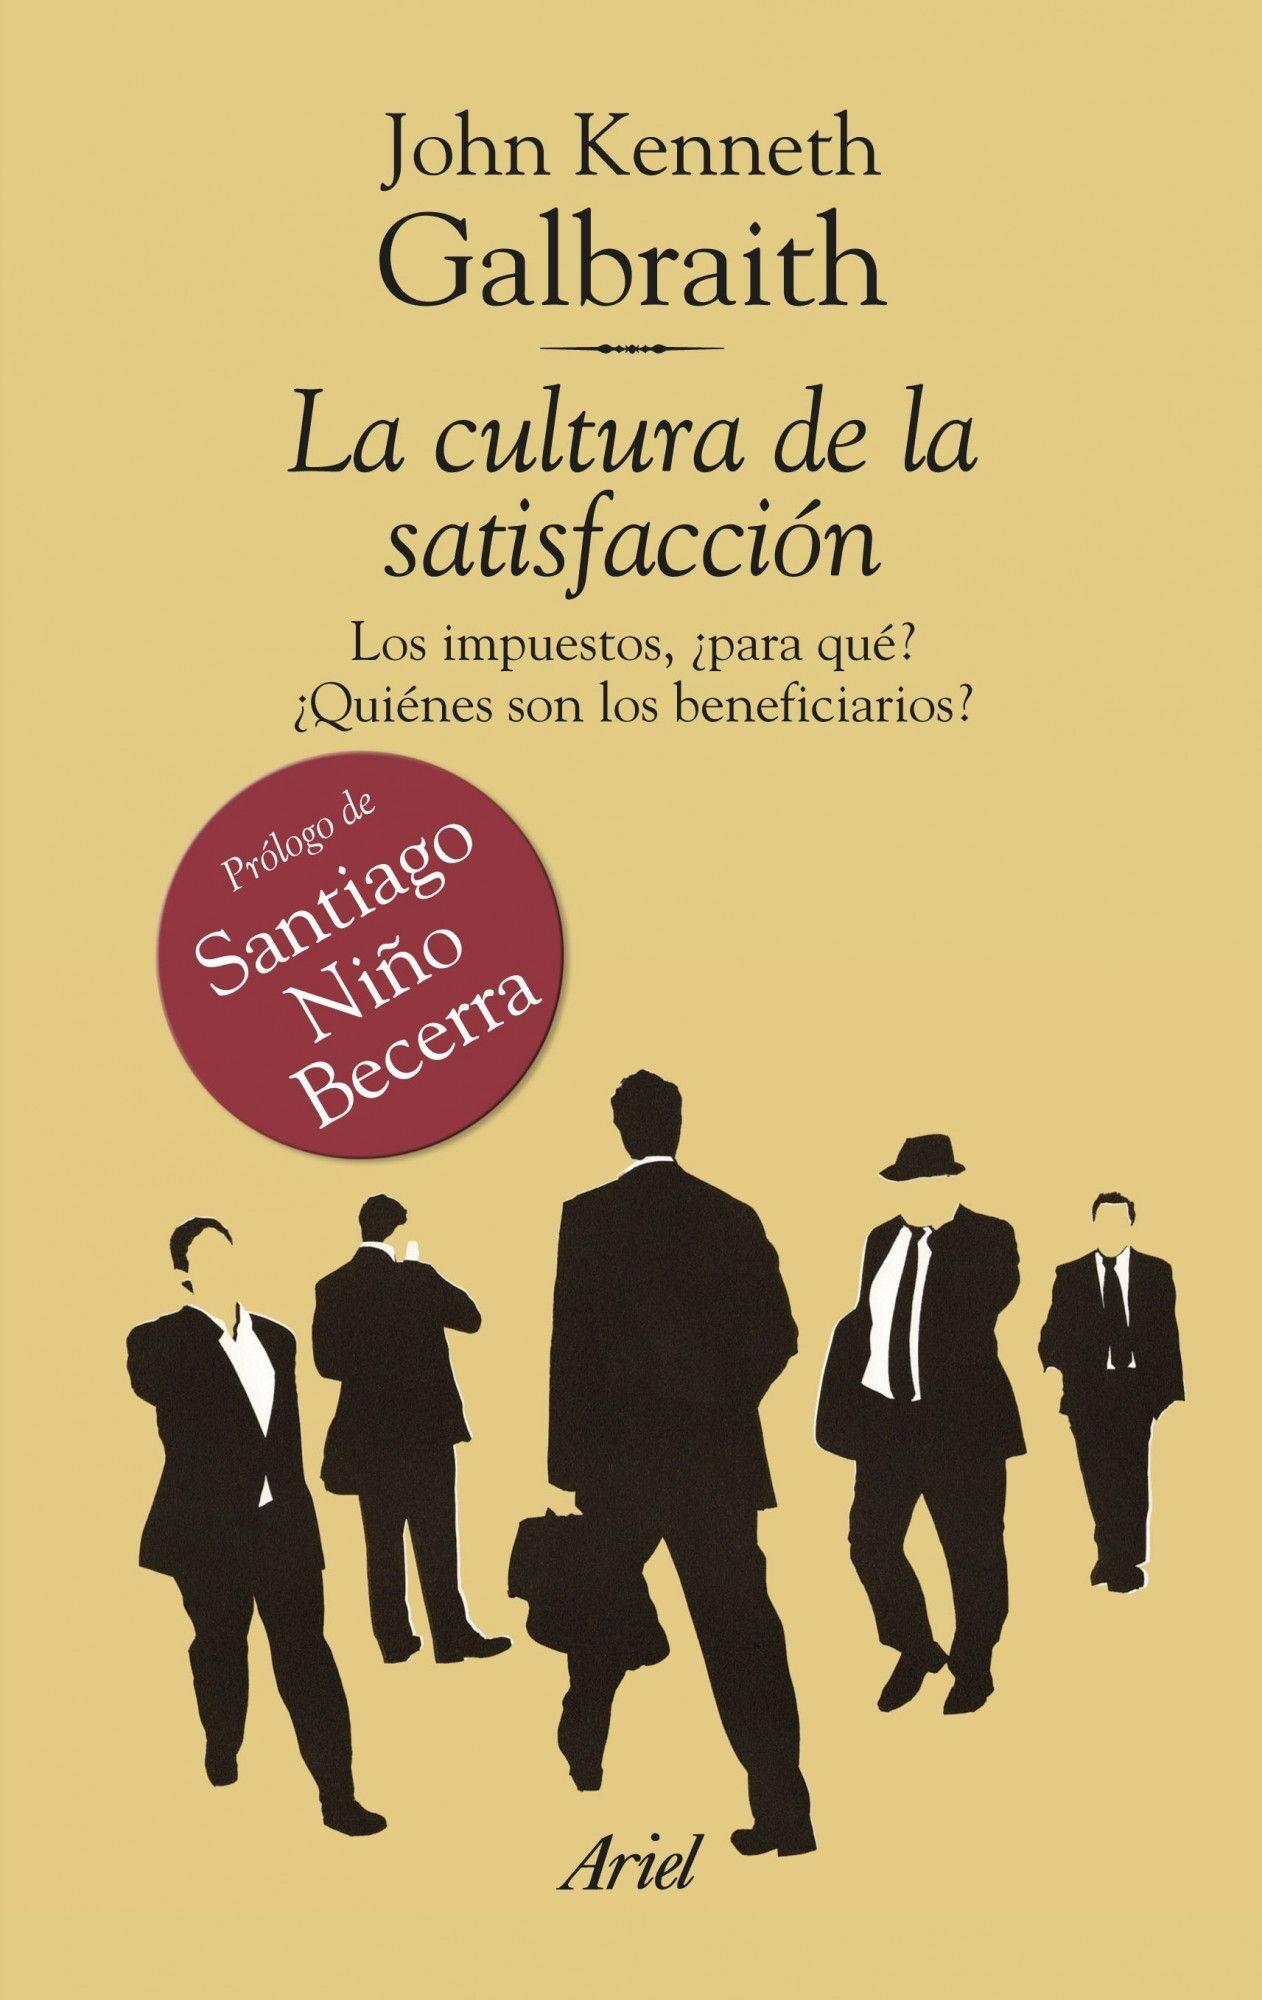 La Cultura De La Satisfaccion por J. K. Galbraith